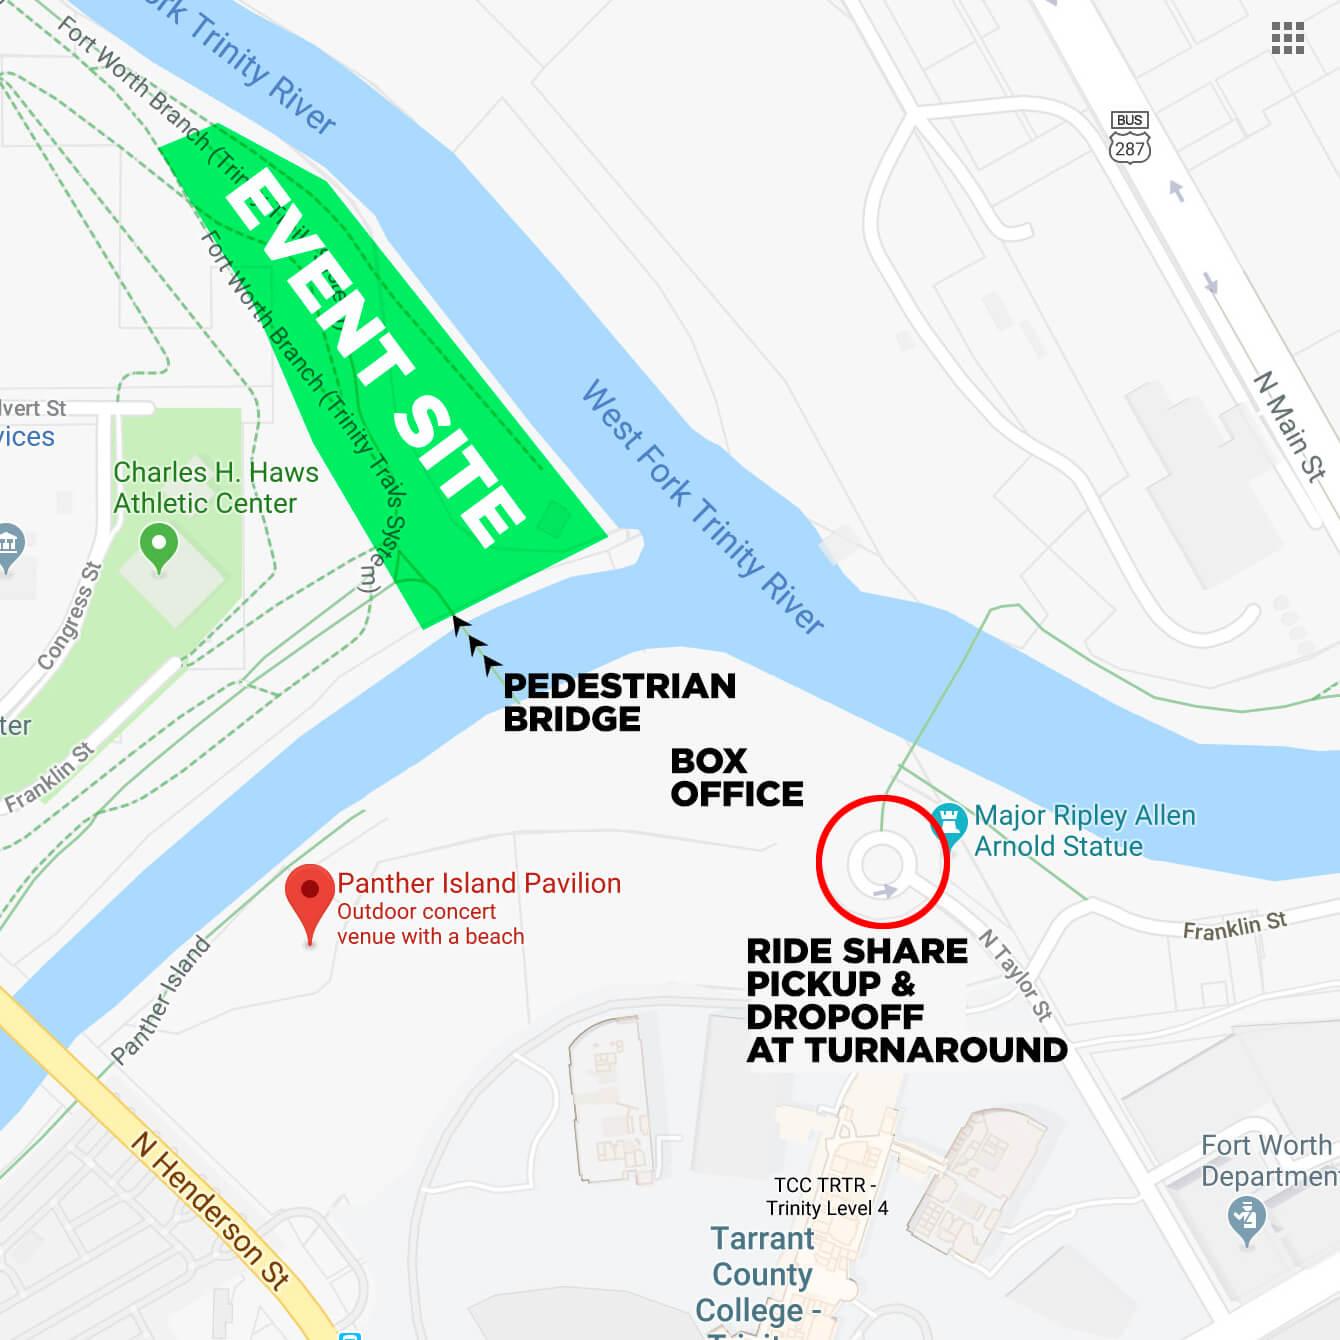 Rideshare Map for Ubbi Dubbi 2019